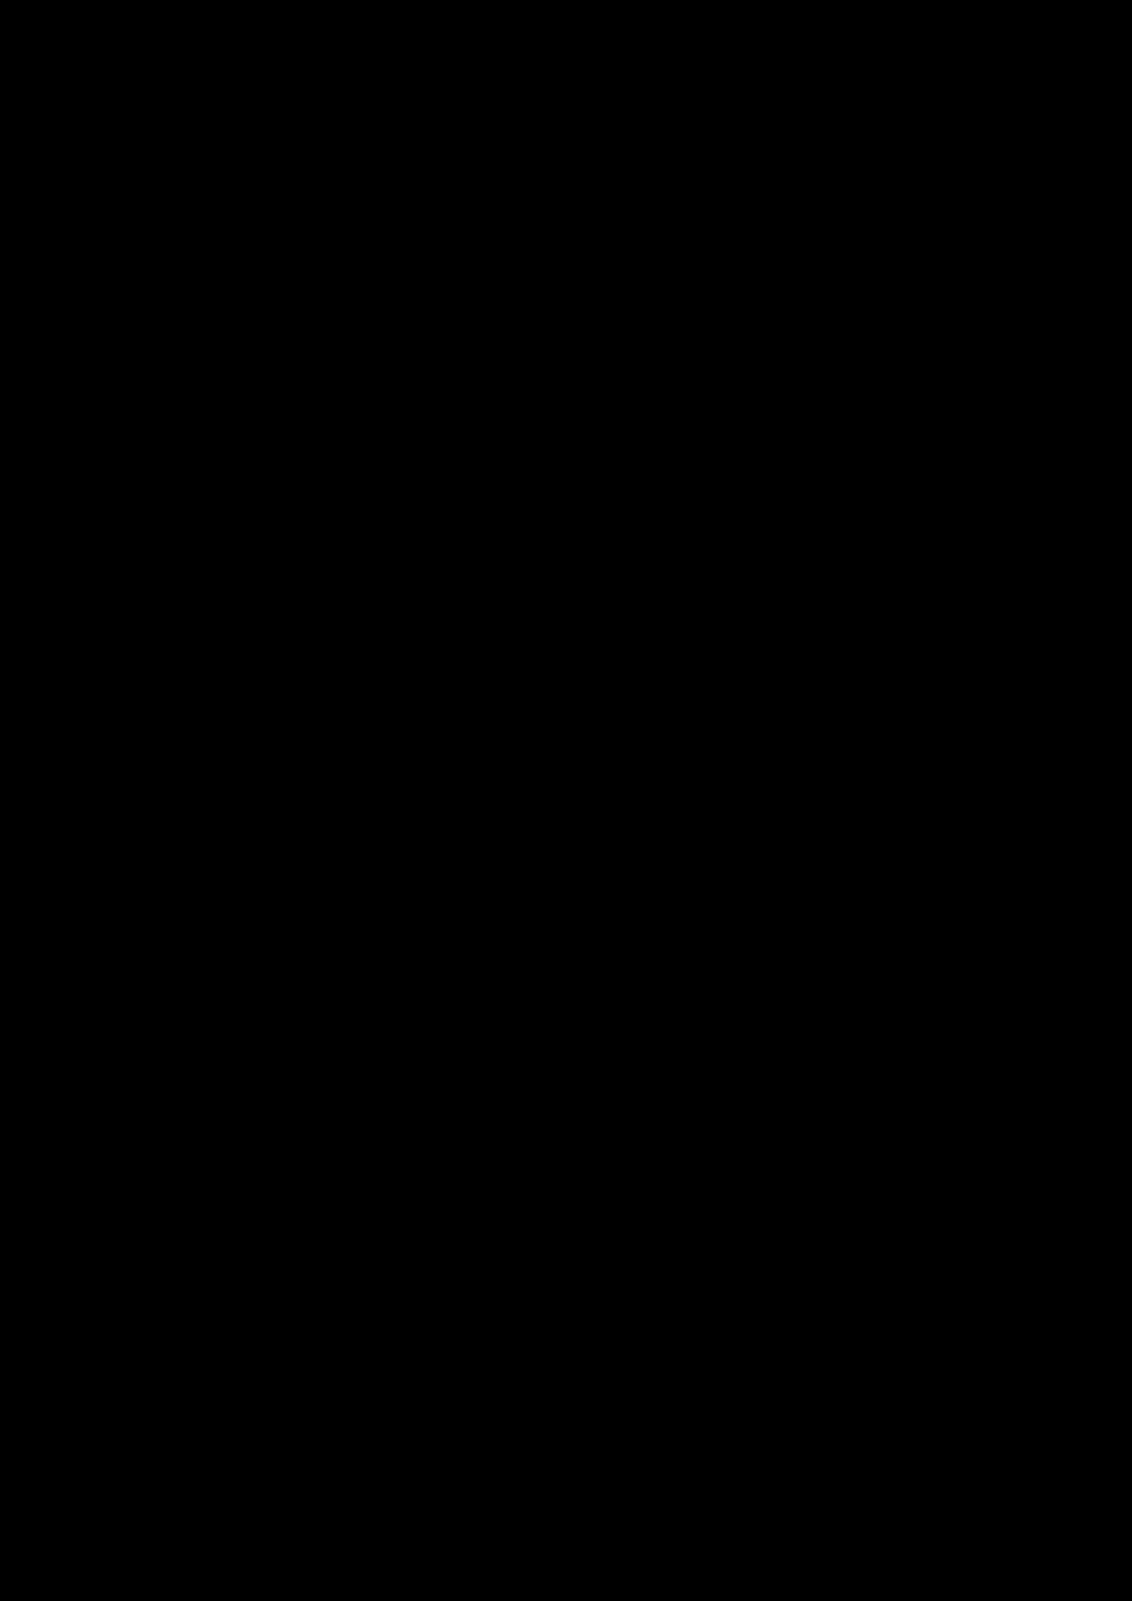 18 berez slide, Image 5